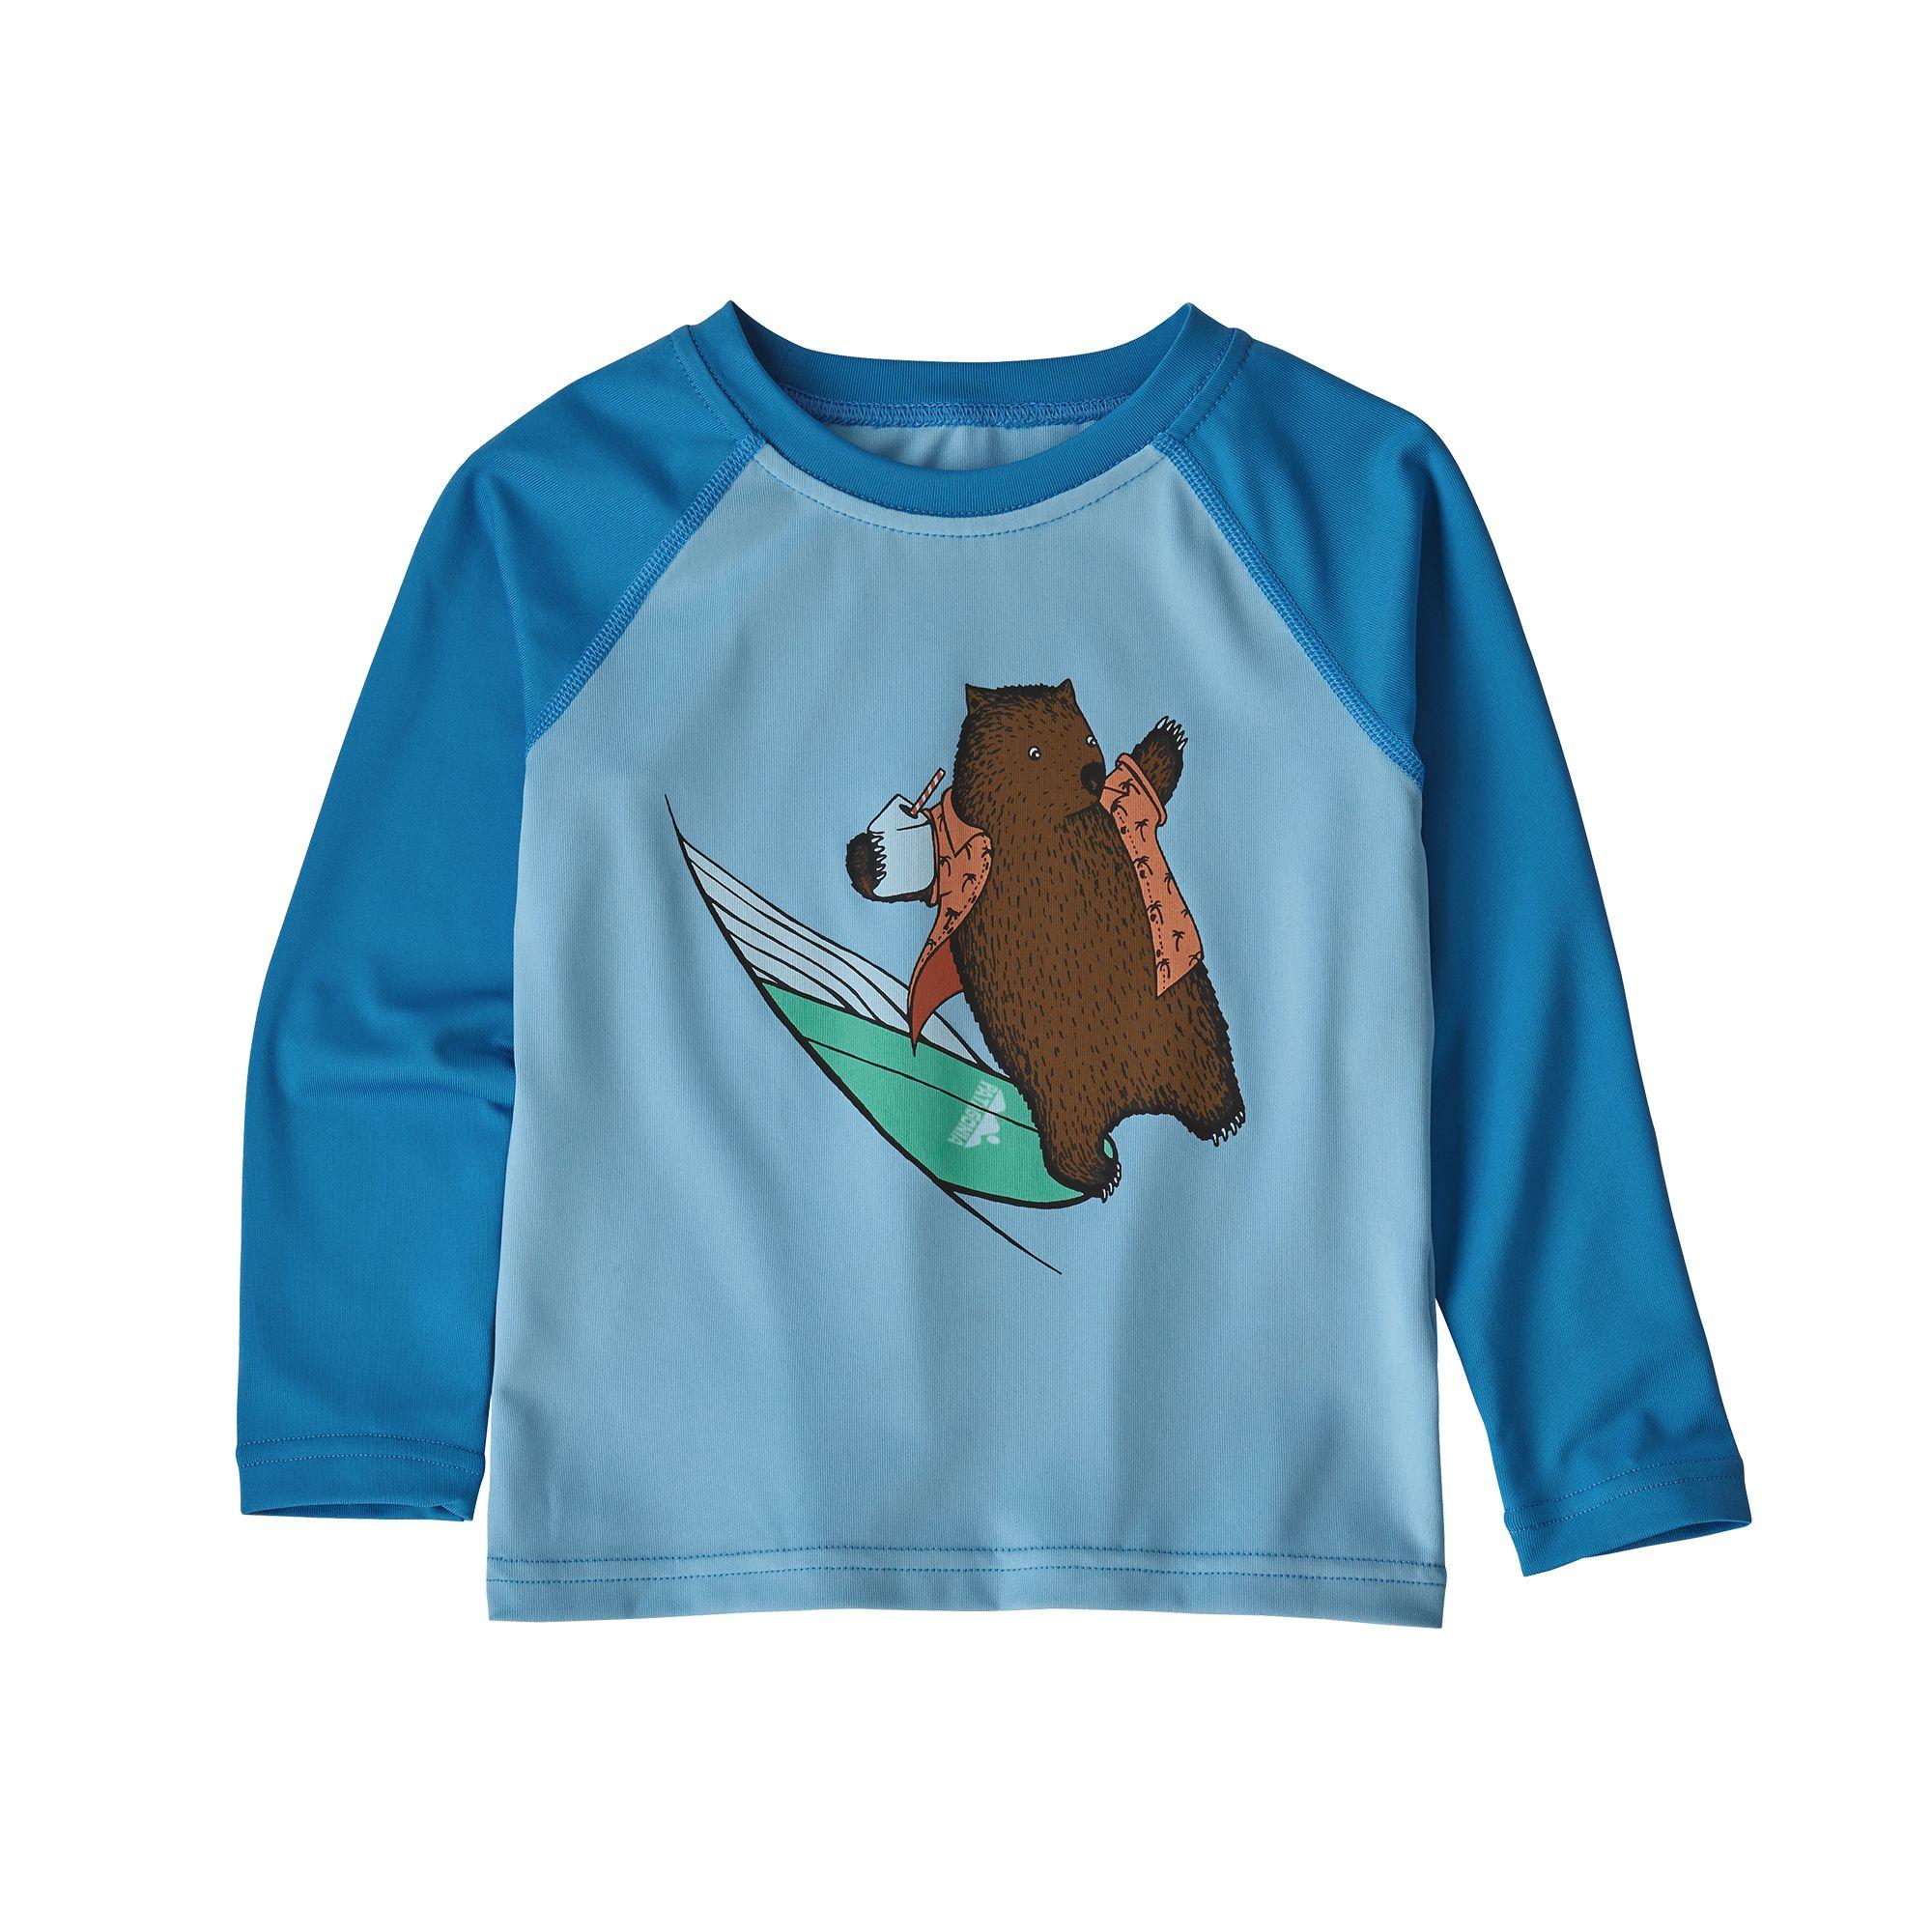 Patagonia - Baby Cap SW Crew - T-Shirt - Kids